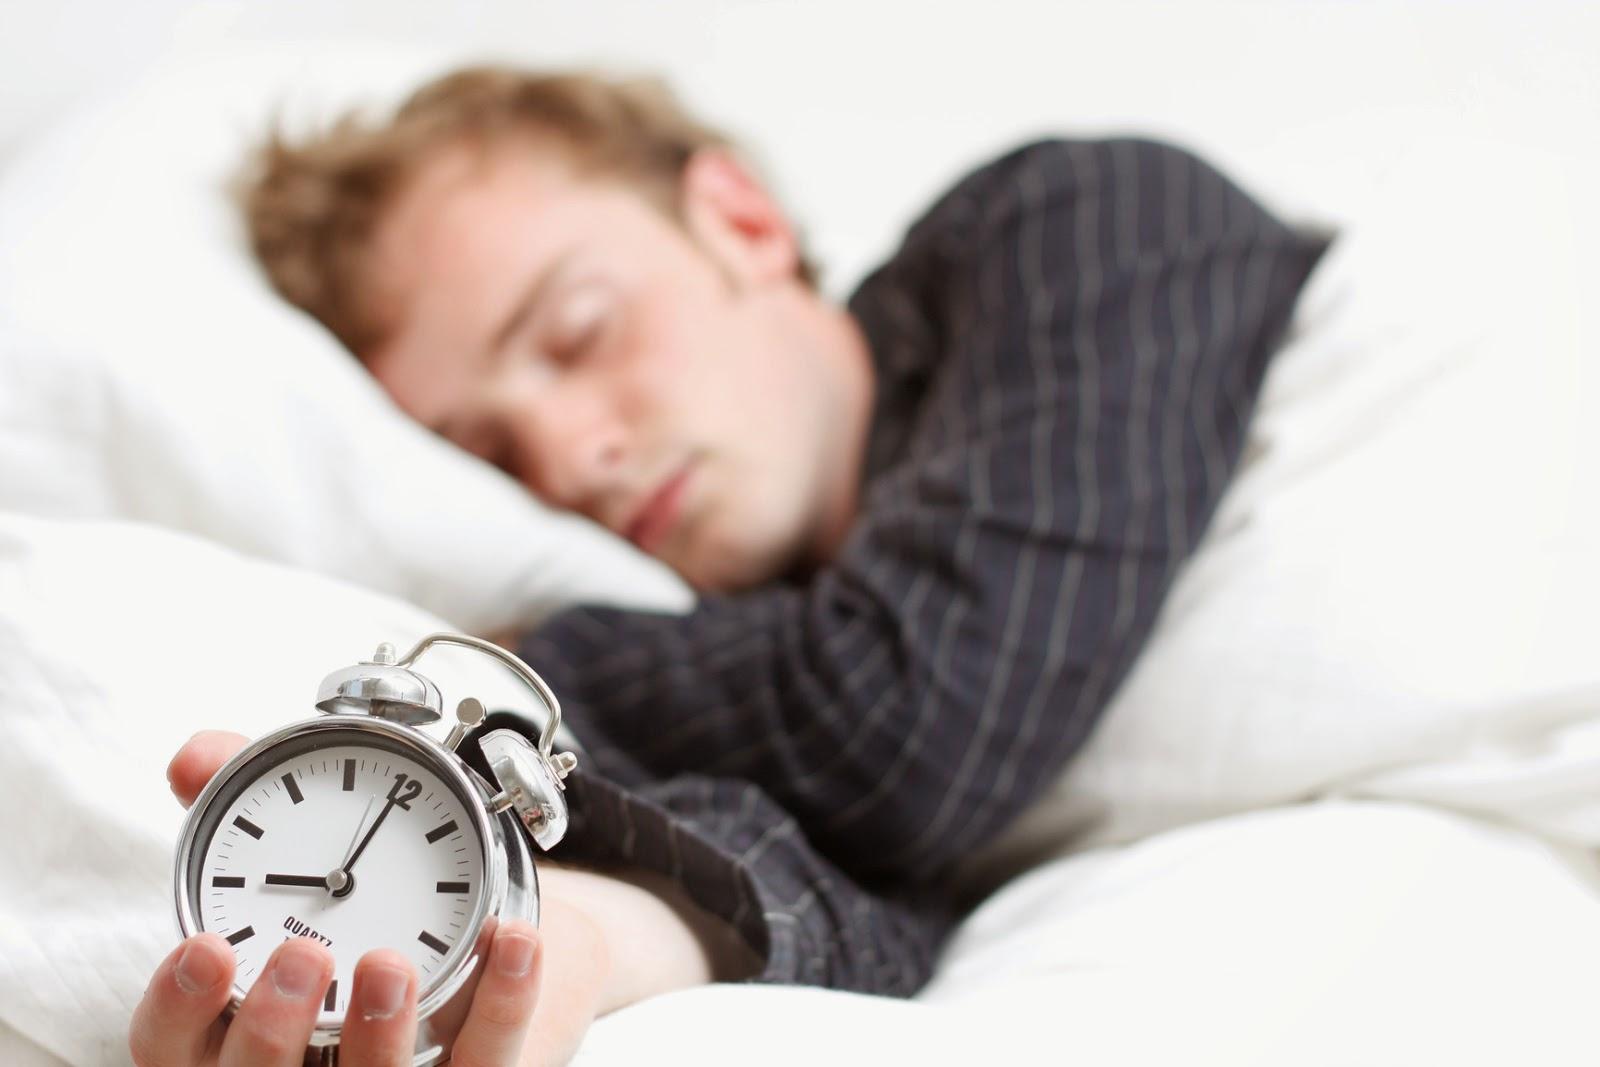 Akibat Sering Tidur Terlalu Lama